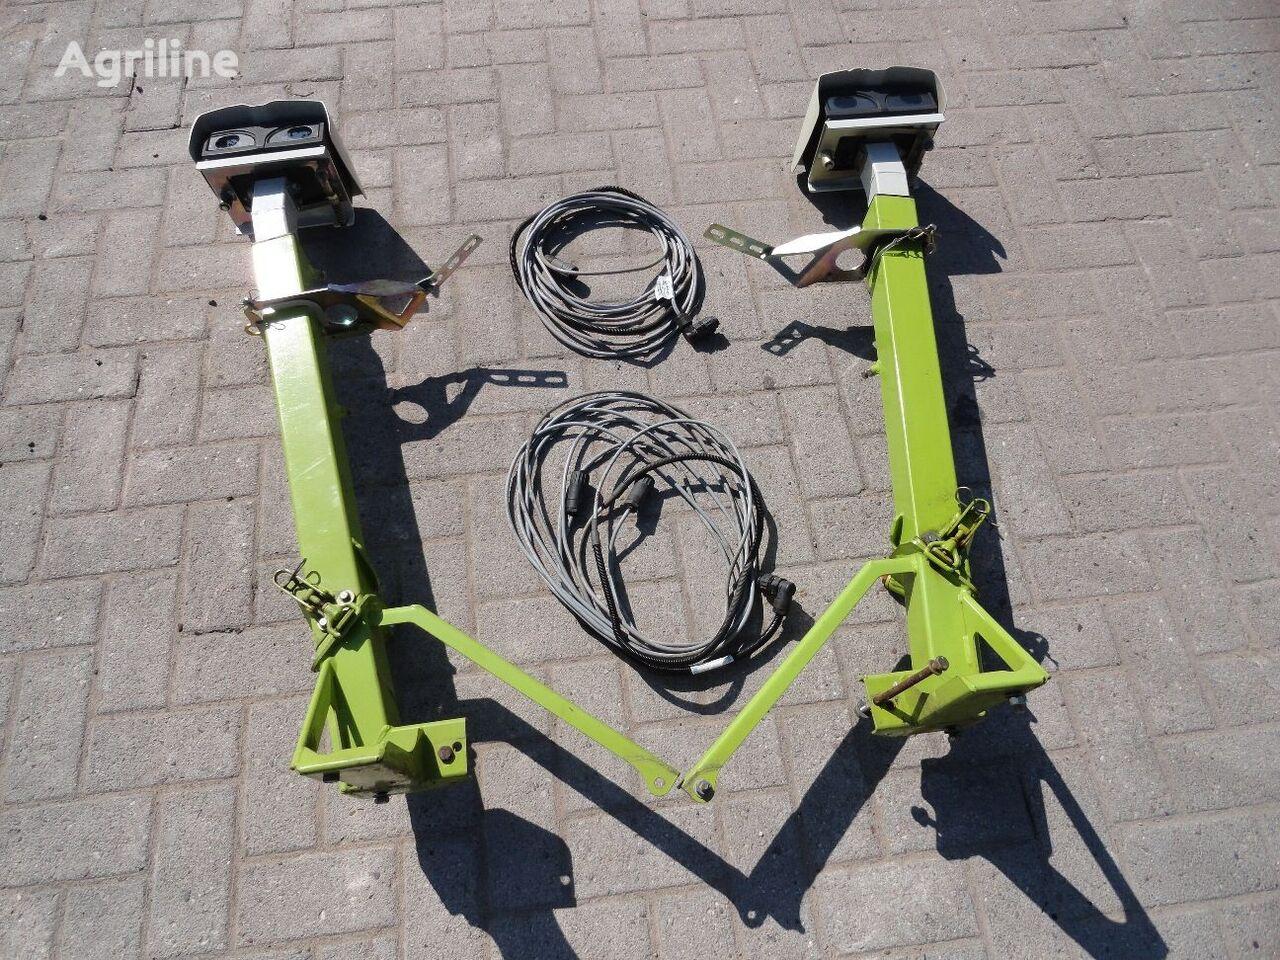 navigacijos sistema CLAAS Laserpilot links und rechts pjaunamosios CLAAS 1050 Vario